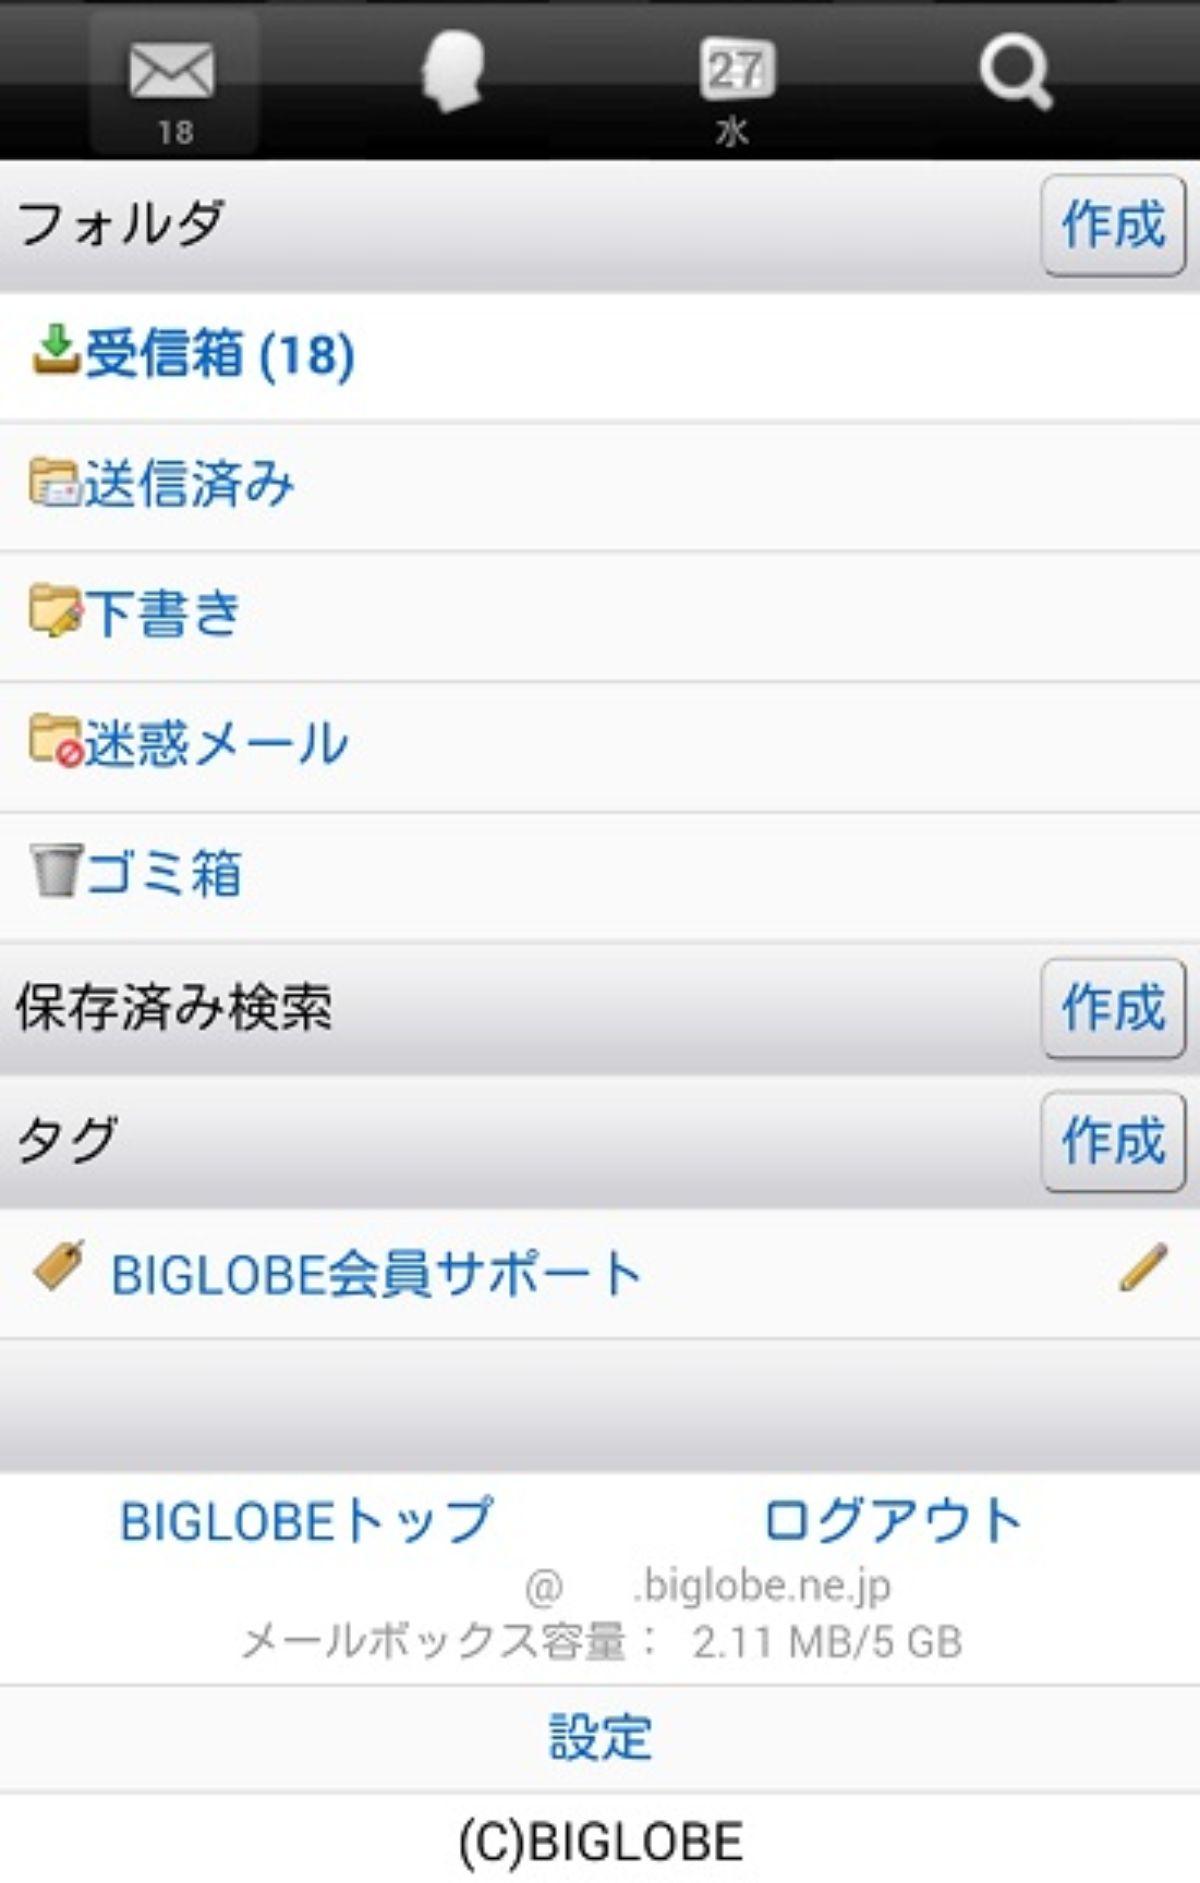 BIGLOBEスマホメールボックス